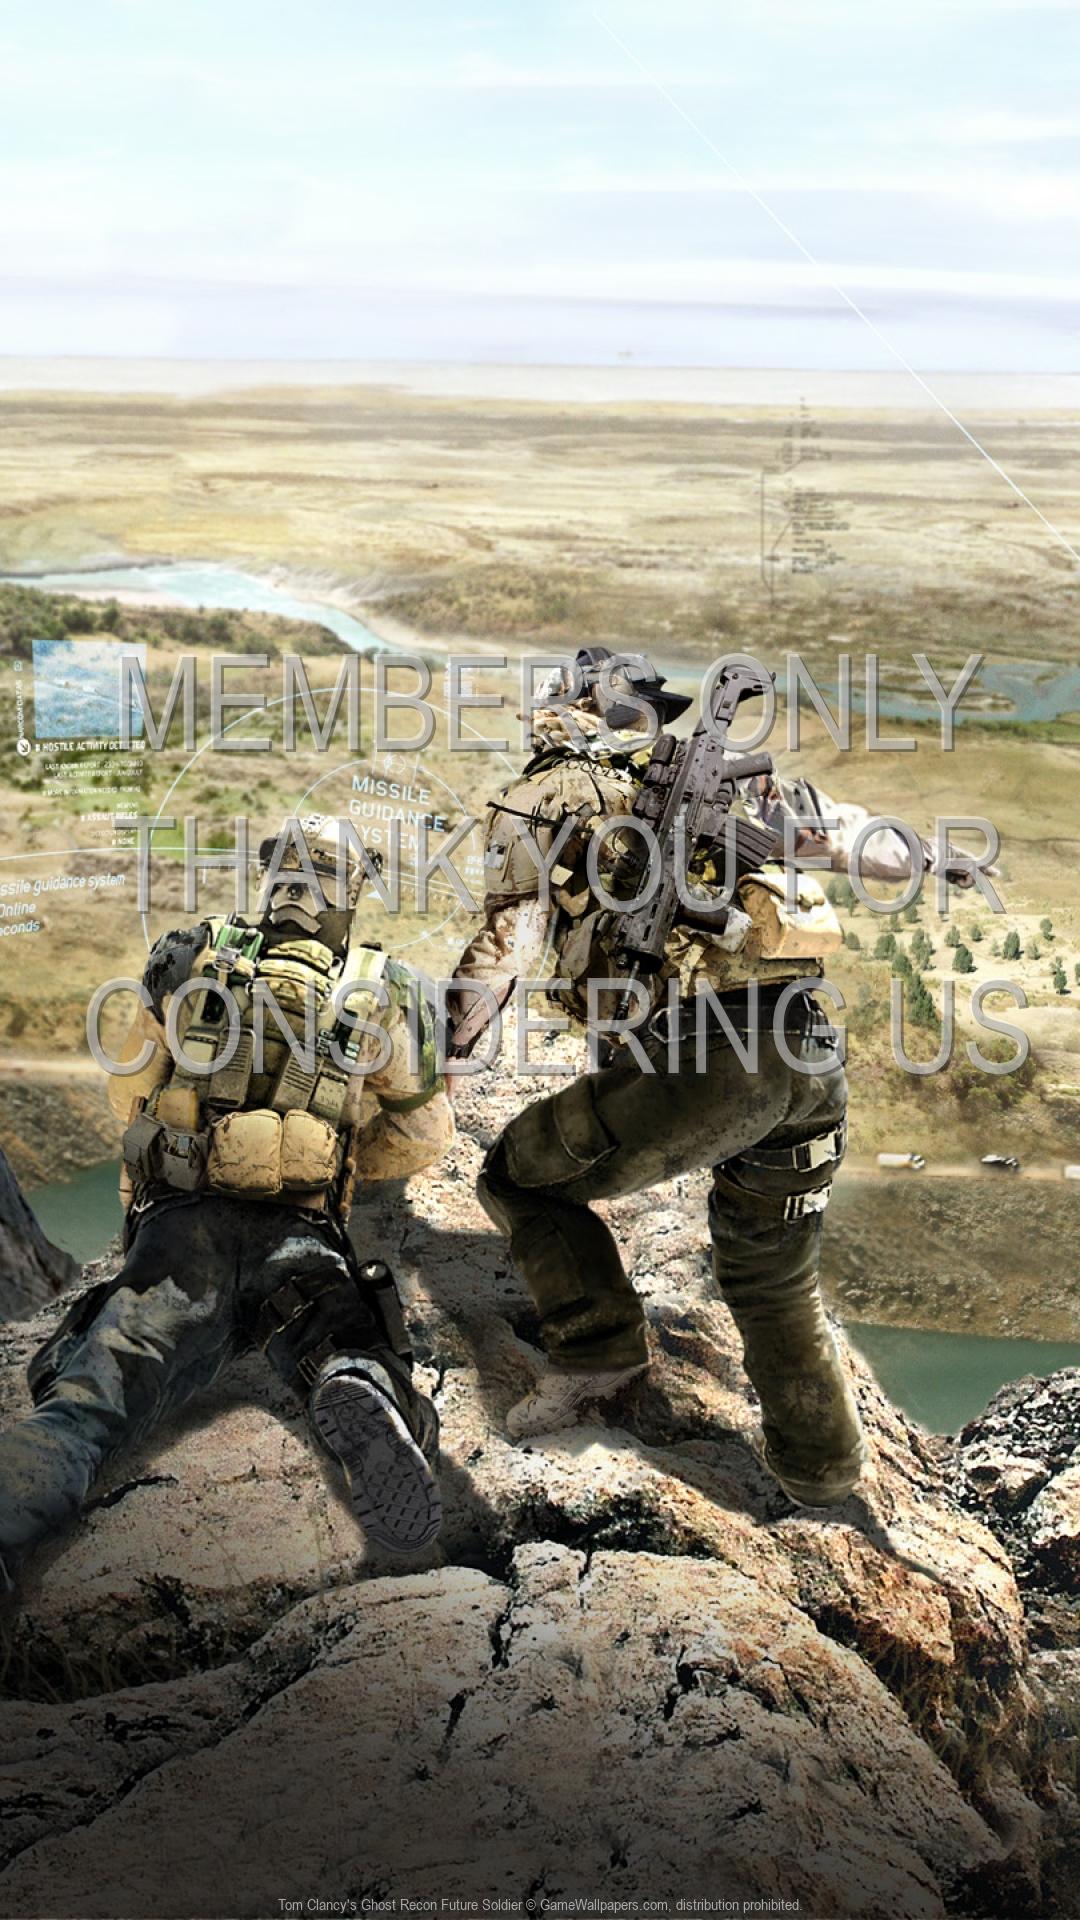 Tom Clancy's Ghost Recon: Future Soldier 1920x1080 Handy Hintergrundbild 07